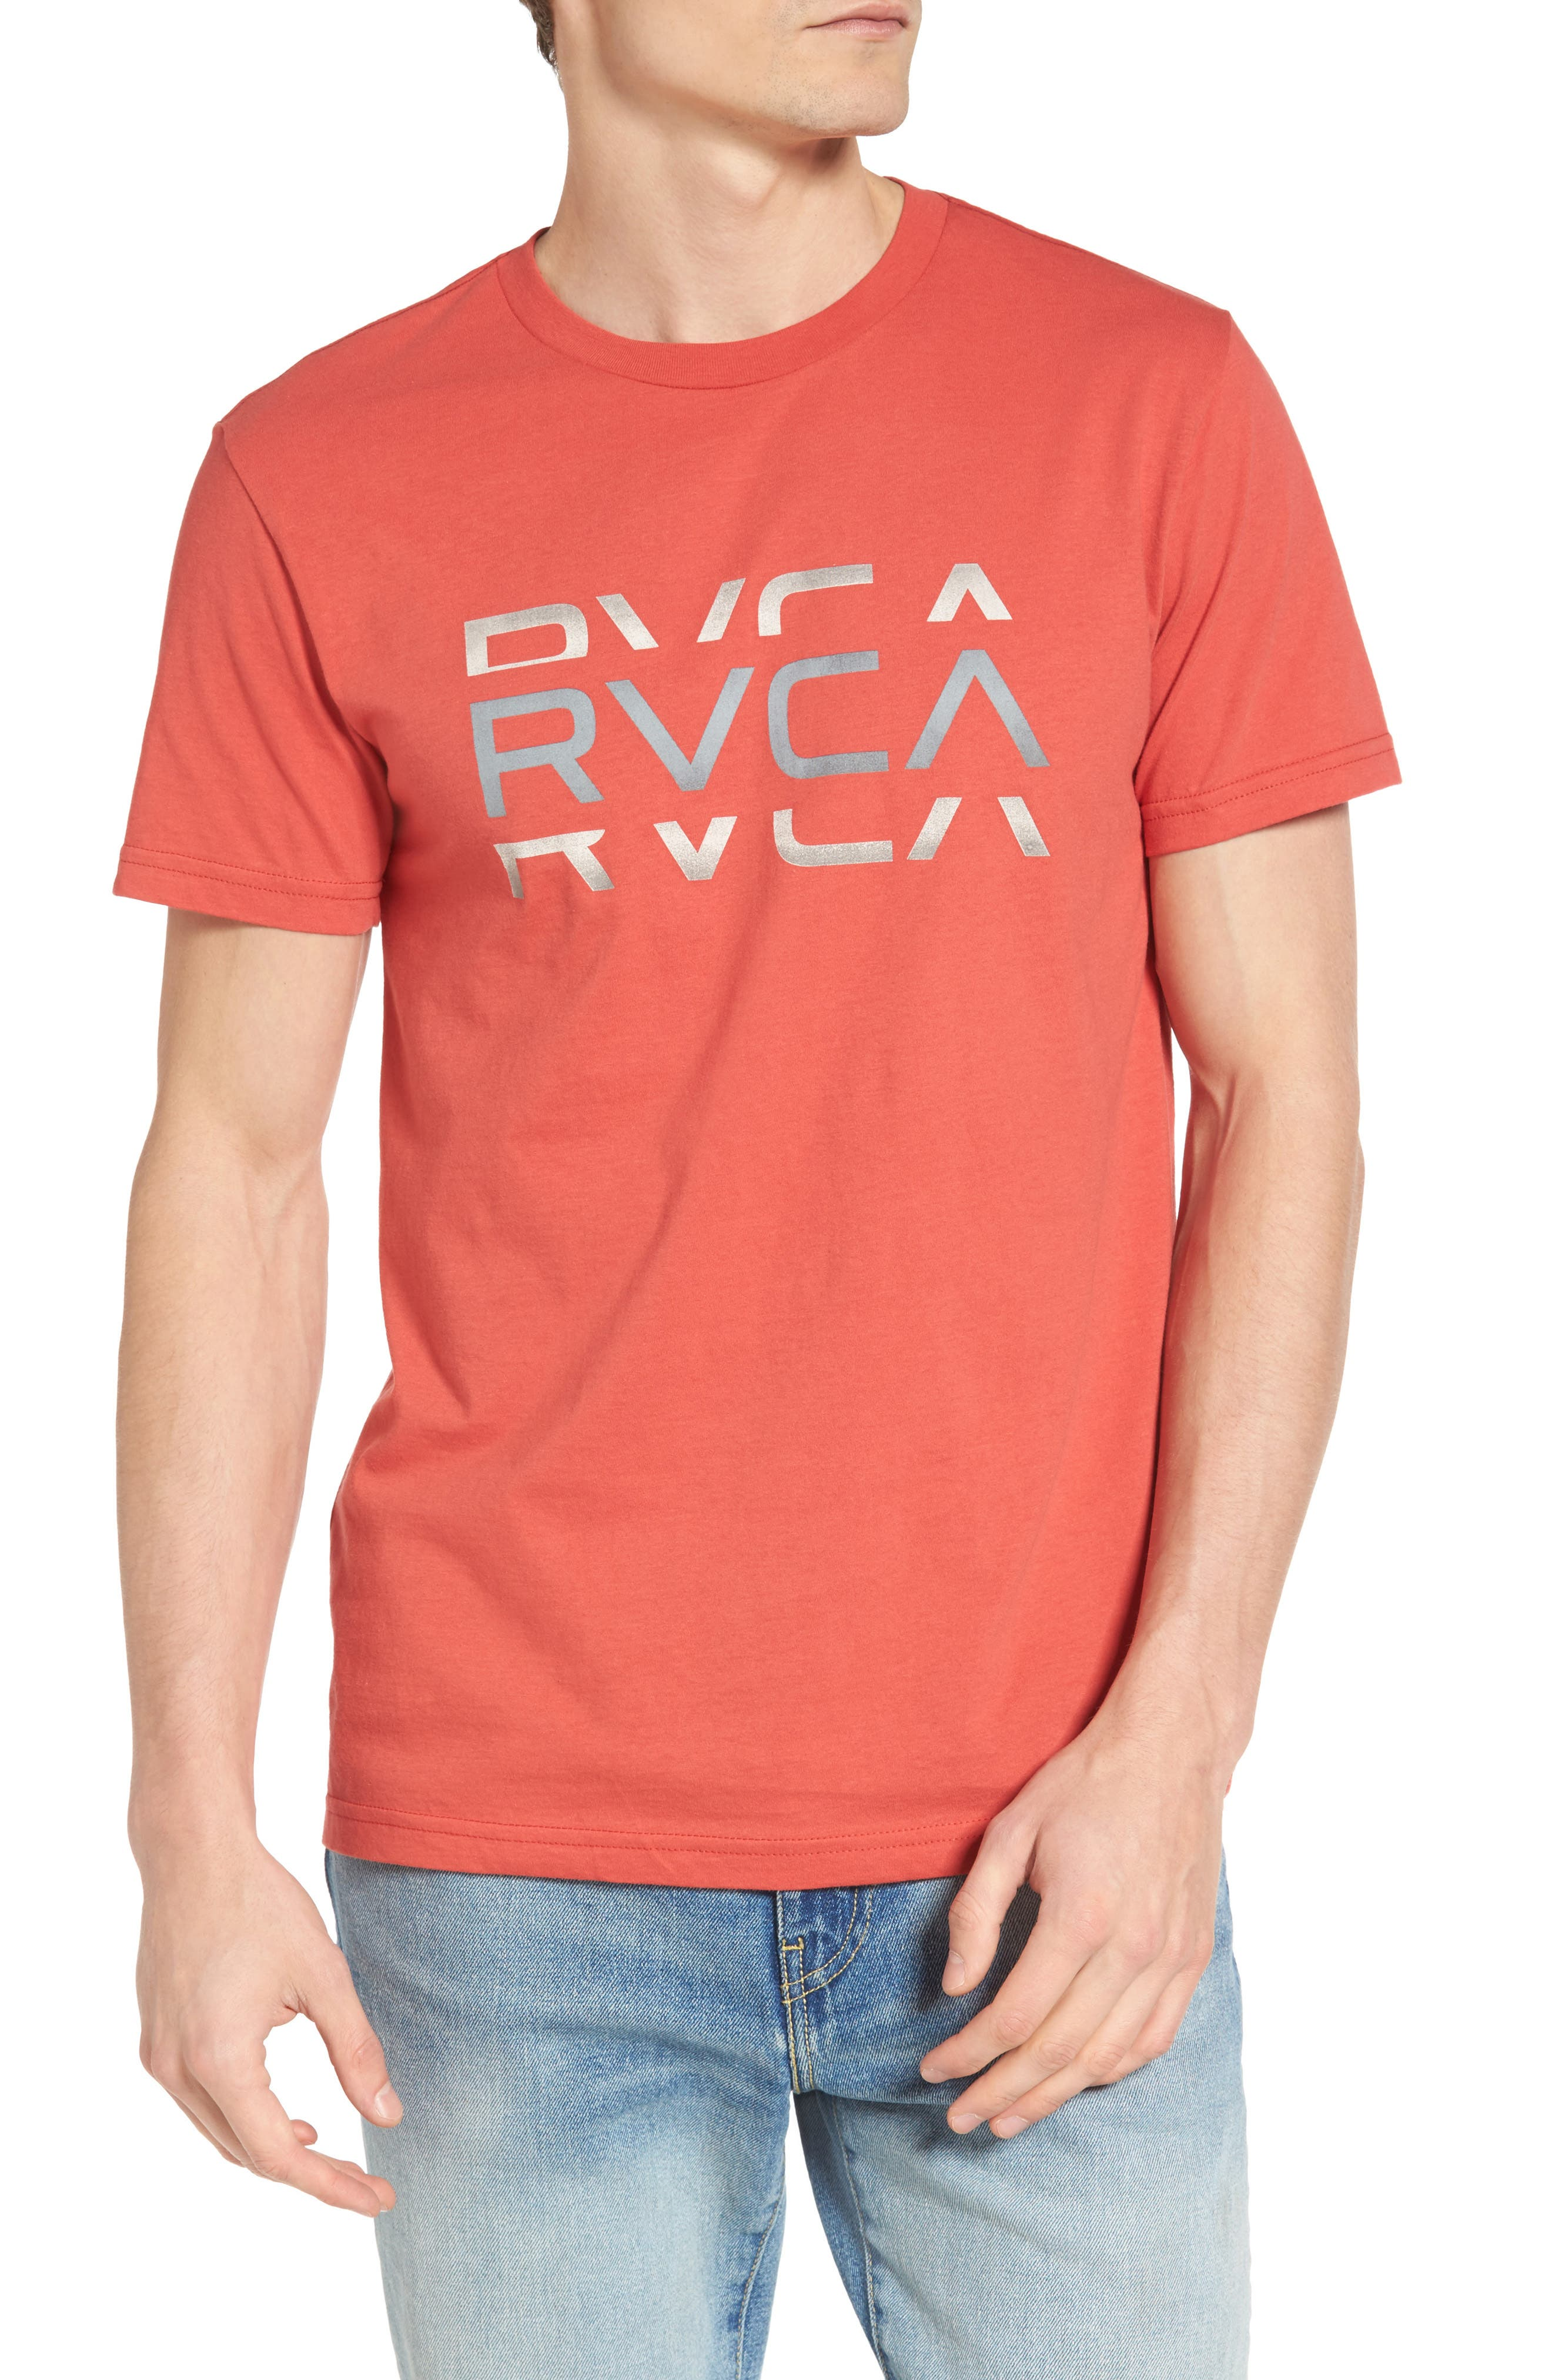 RVCA Cut Graphic T-Shirt